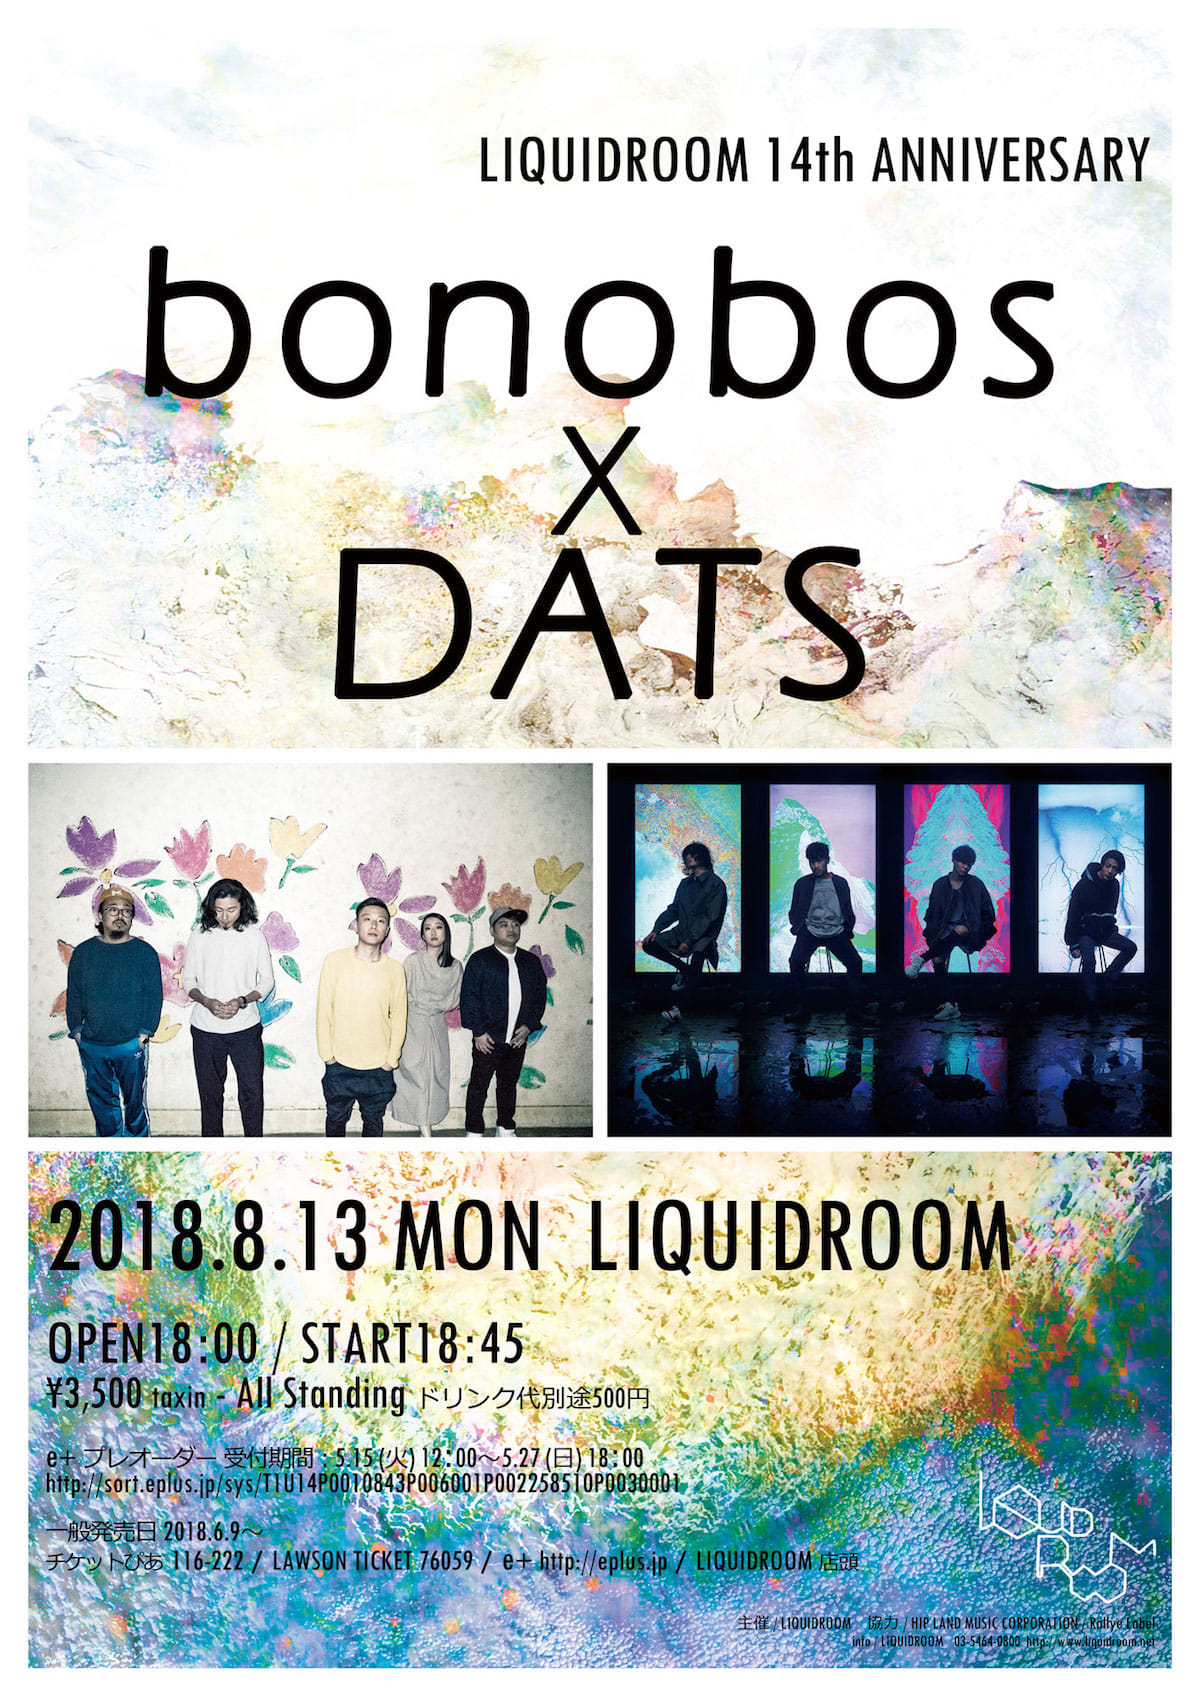 LIQUIDROOM14周年公演に電気グルーヴやZAZEN BOYS、bonobos×DATSが登場 music180515_liquidroom_2-1200x1697